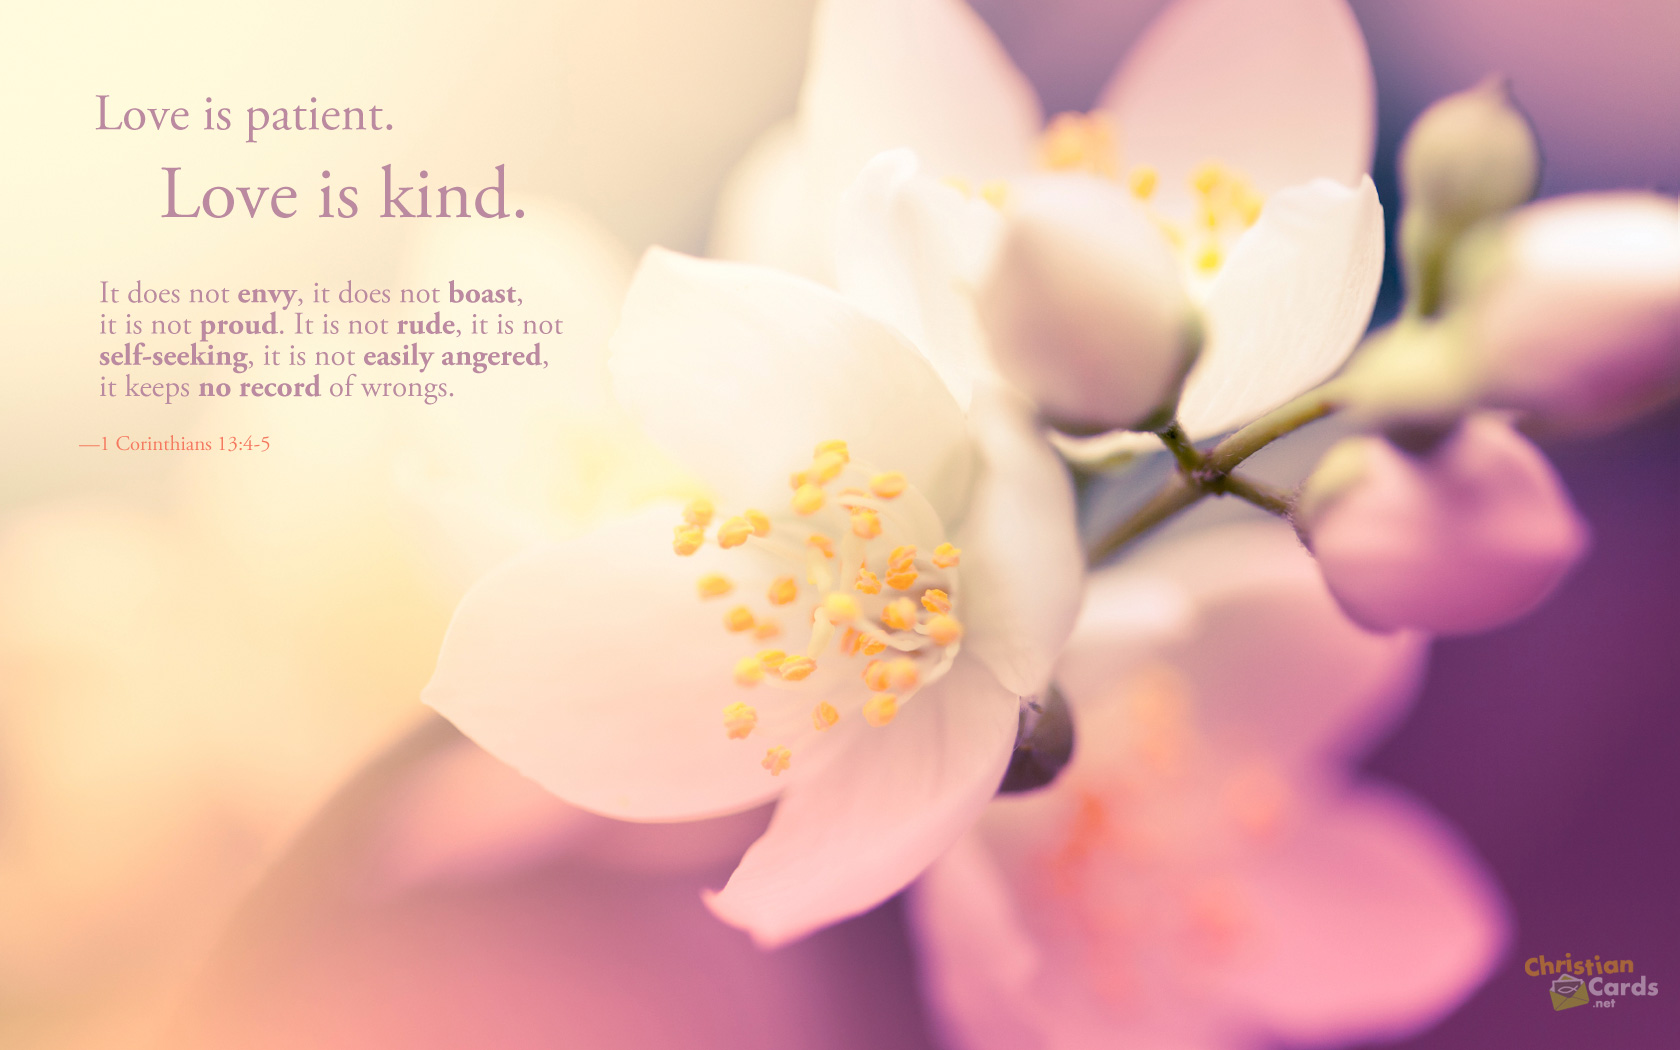 Bible Inspirational Quotes Hd Wallpaper - Christian Inspirational Quotes Wallpaper Hd - HD Wallpaper